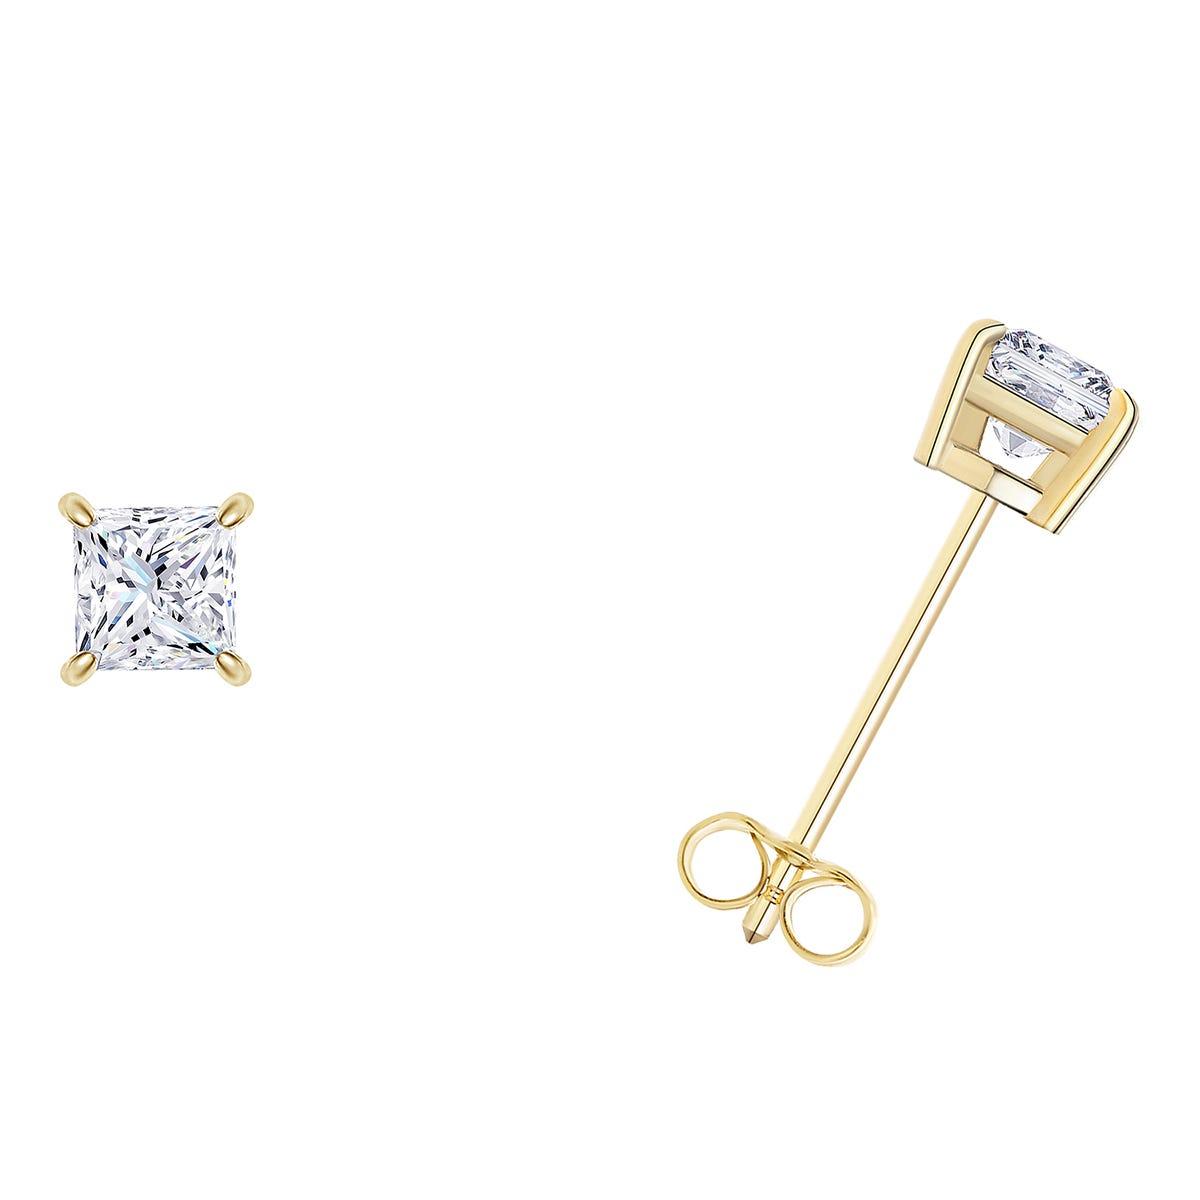 1/10 CTTW Princess Cut Diamond Solitaire Stud Earrings in 14K yellow Gold IGI Certified